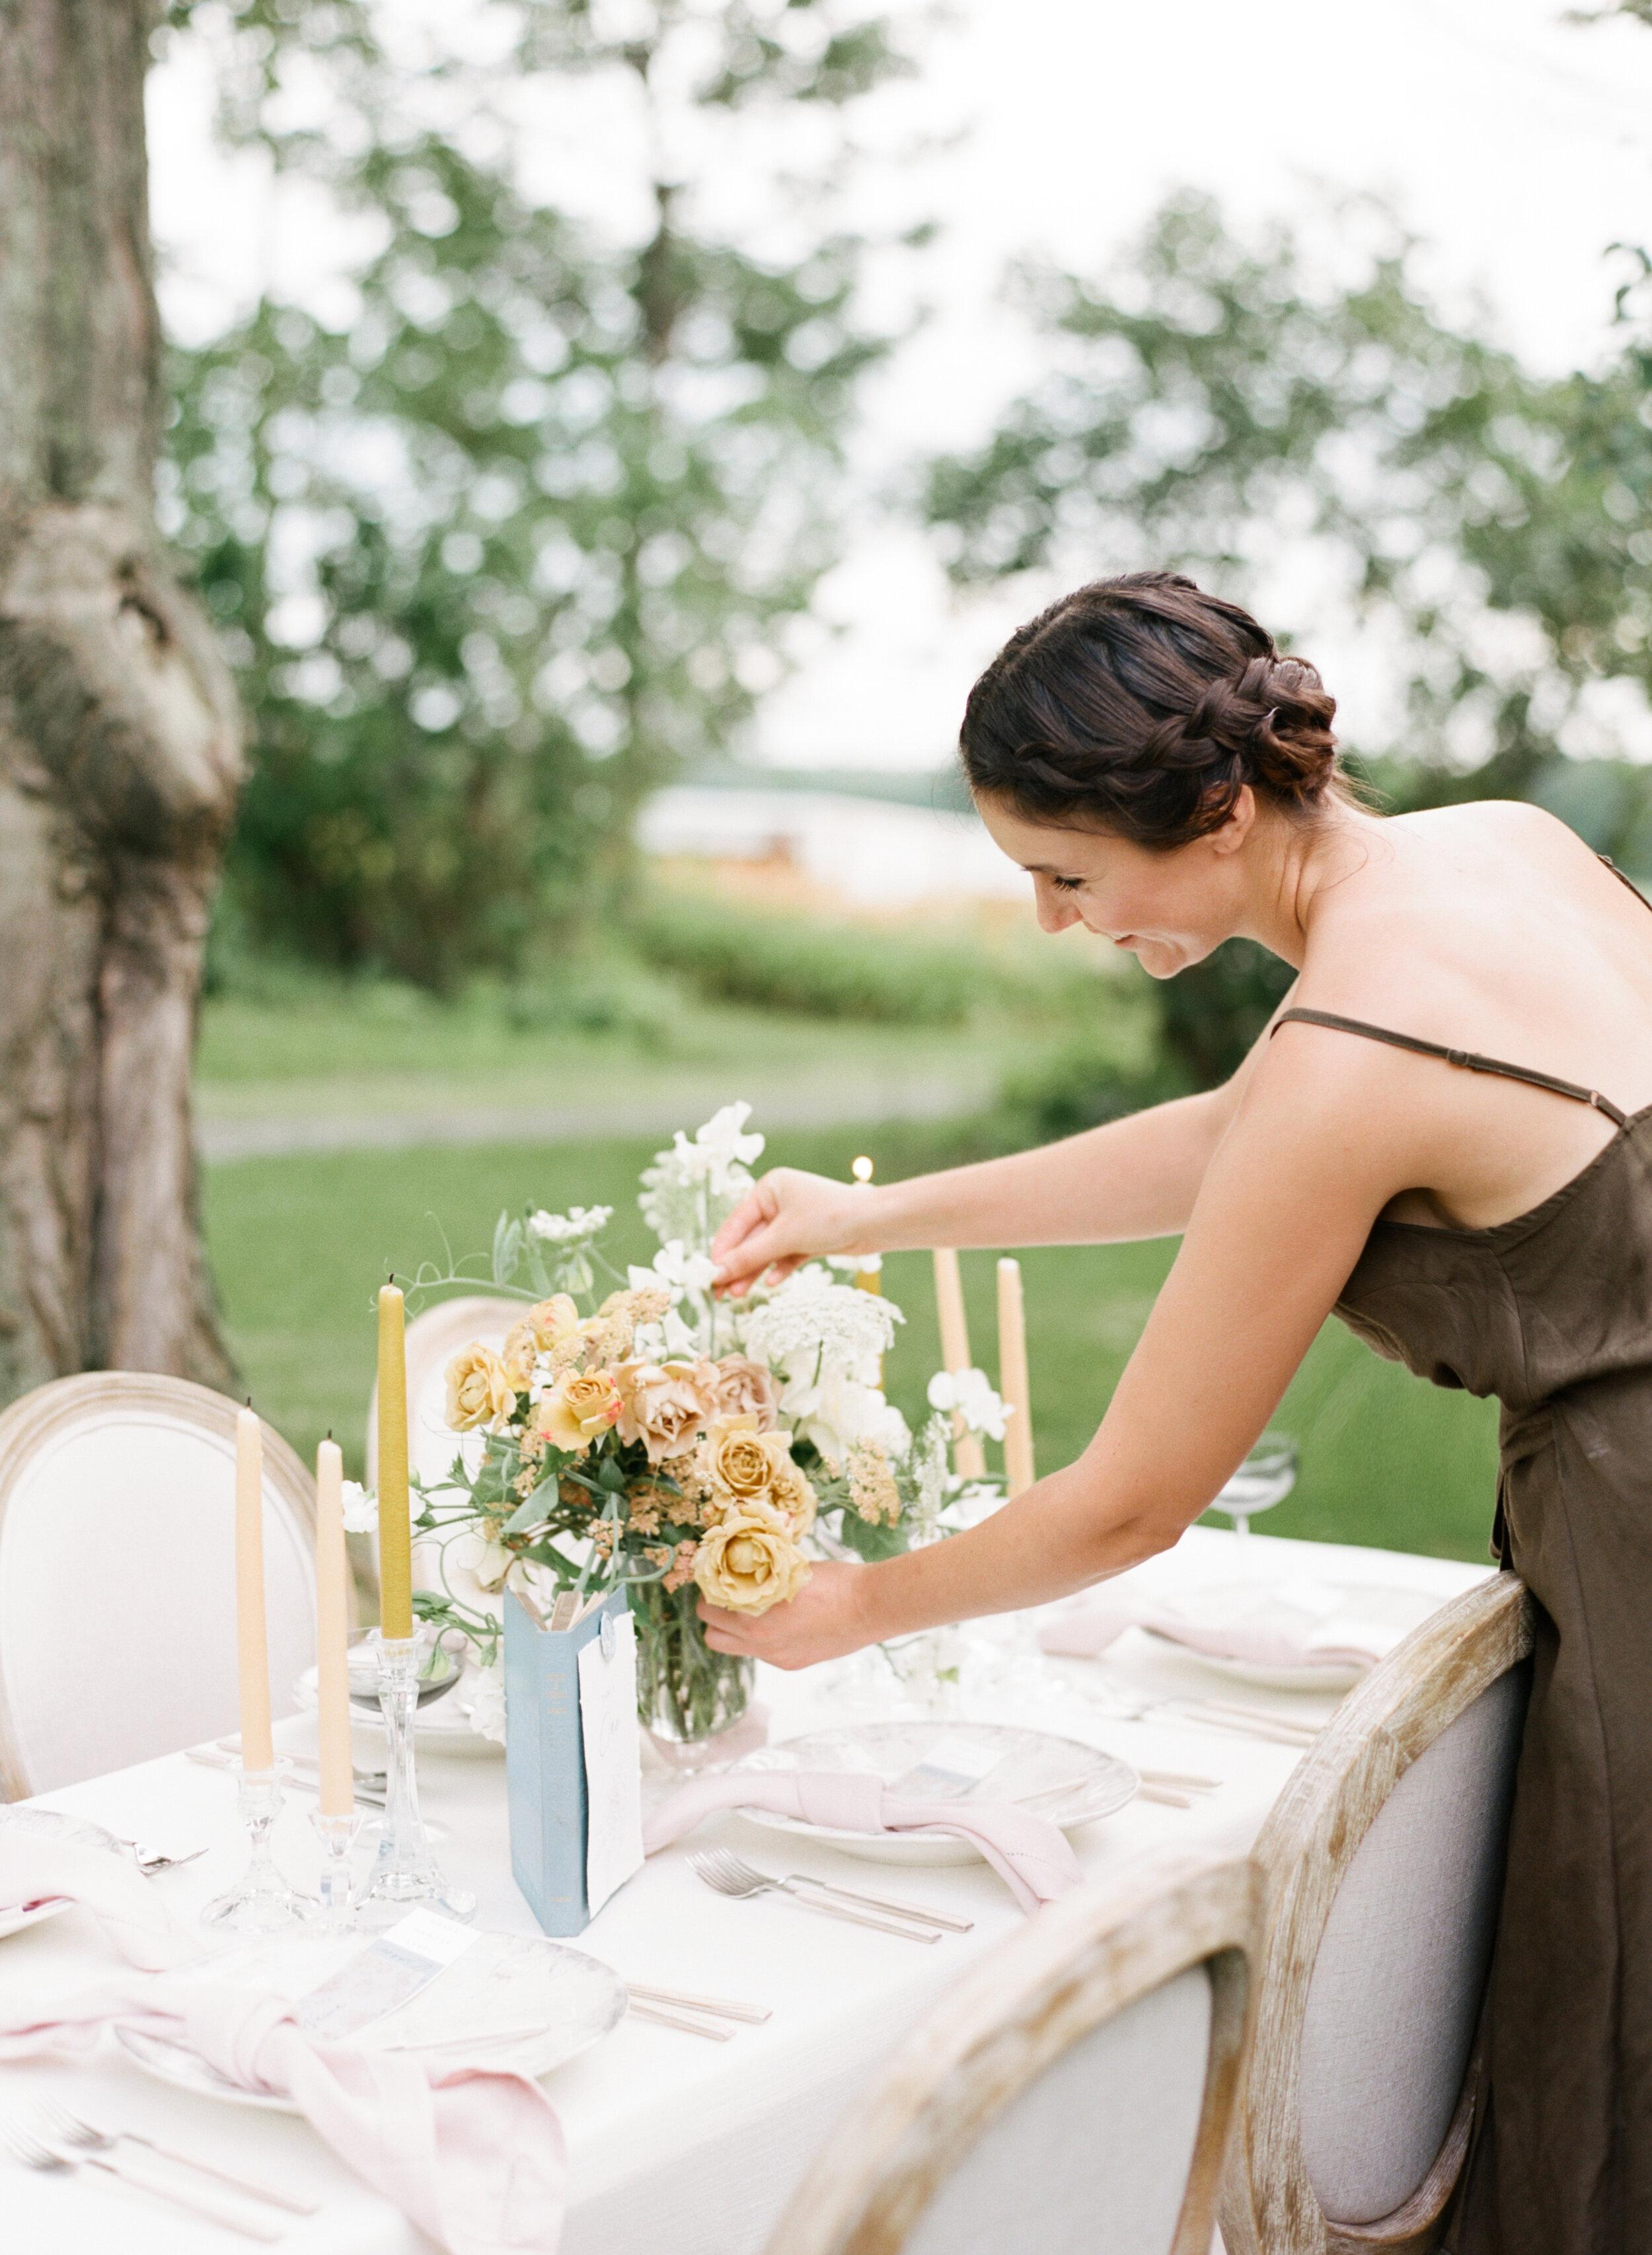 alexandra-meseke-understated-soft-luxury-wedding-upstate-ny_0137.jpg